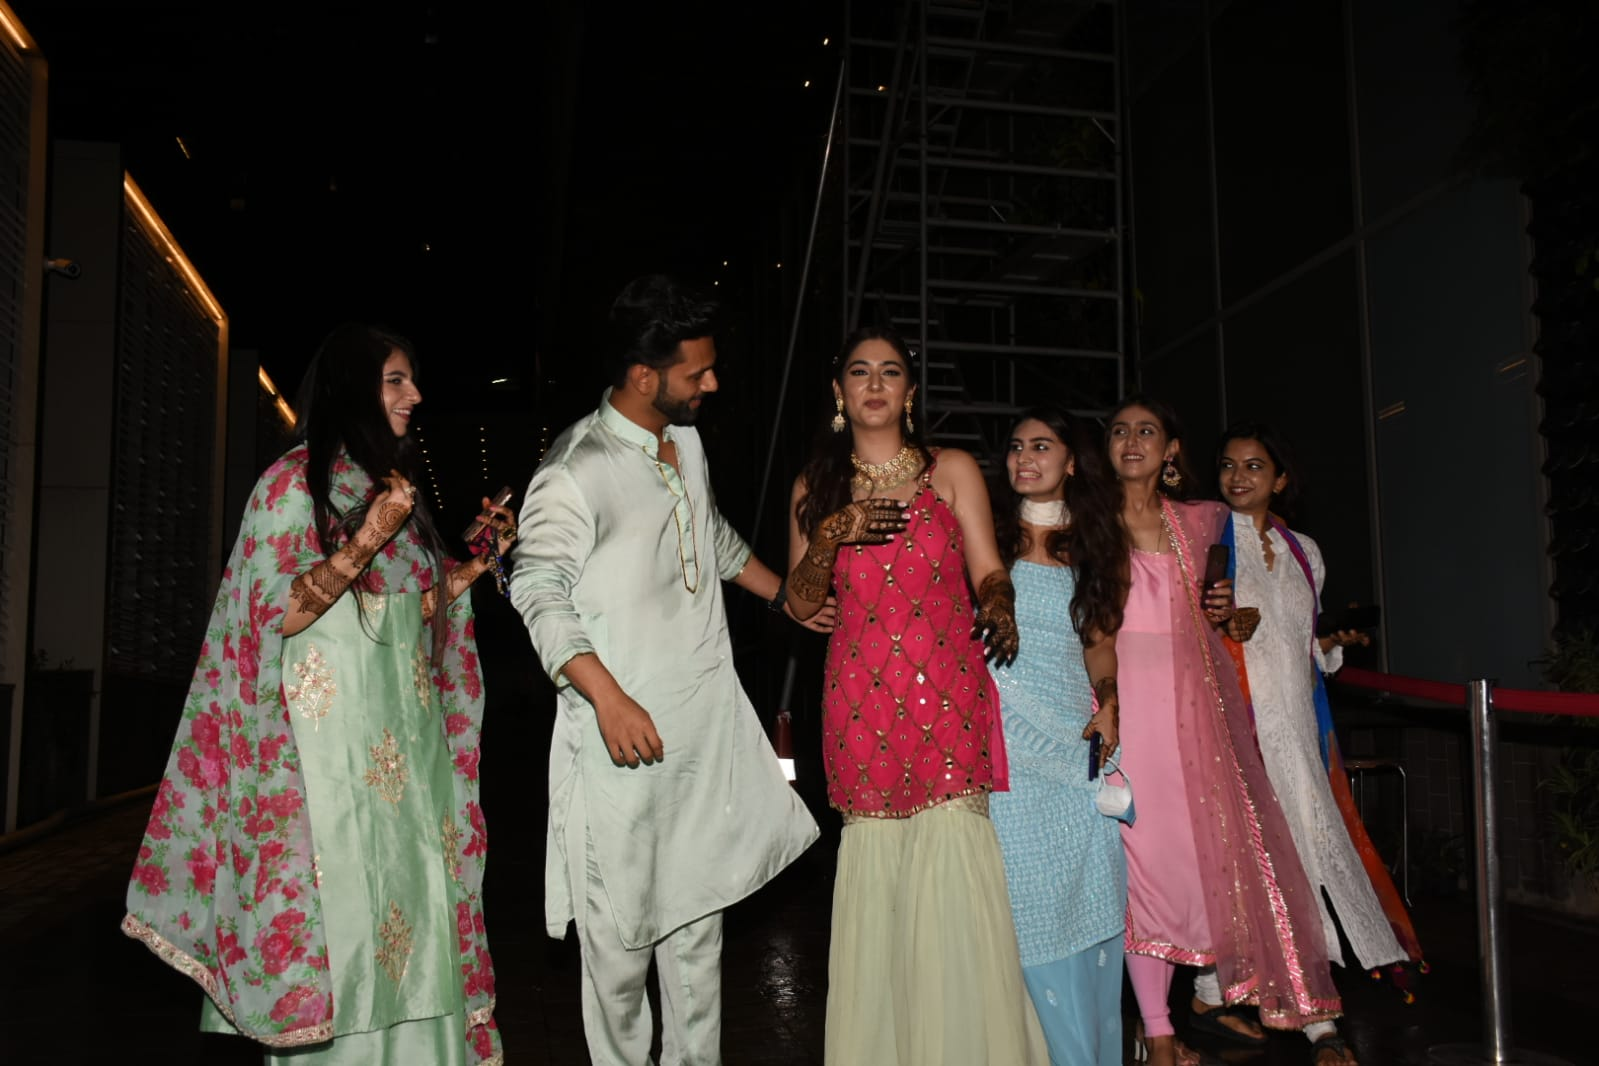 Rahul Vaidya poses with her 'saalis', Disha Parmar's friends and sisters on Mehendi Ceremony